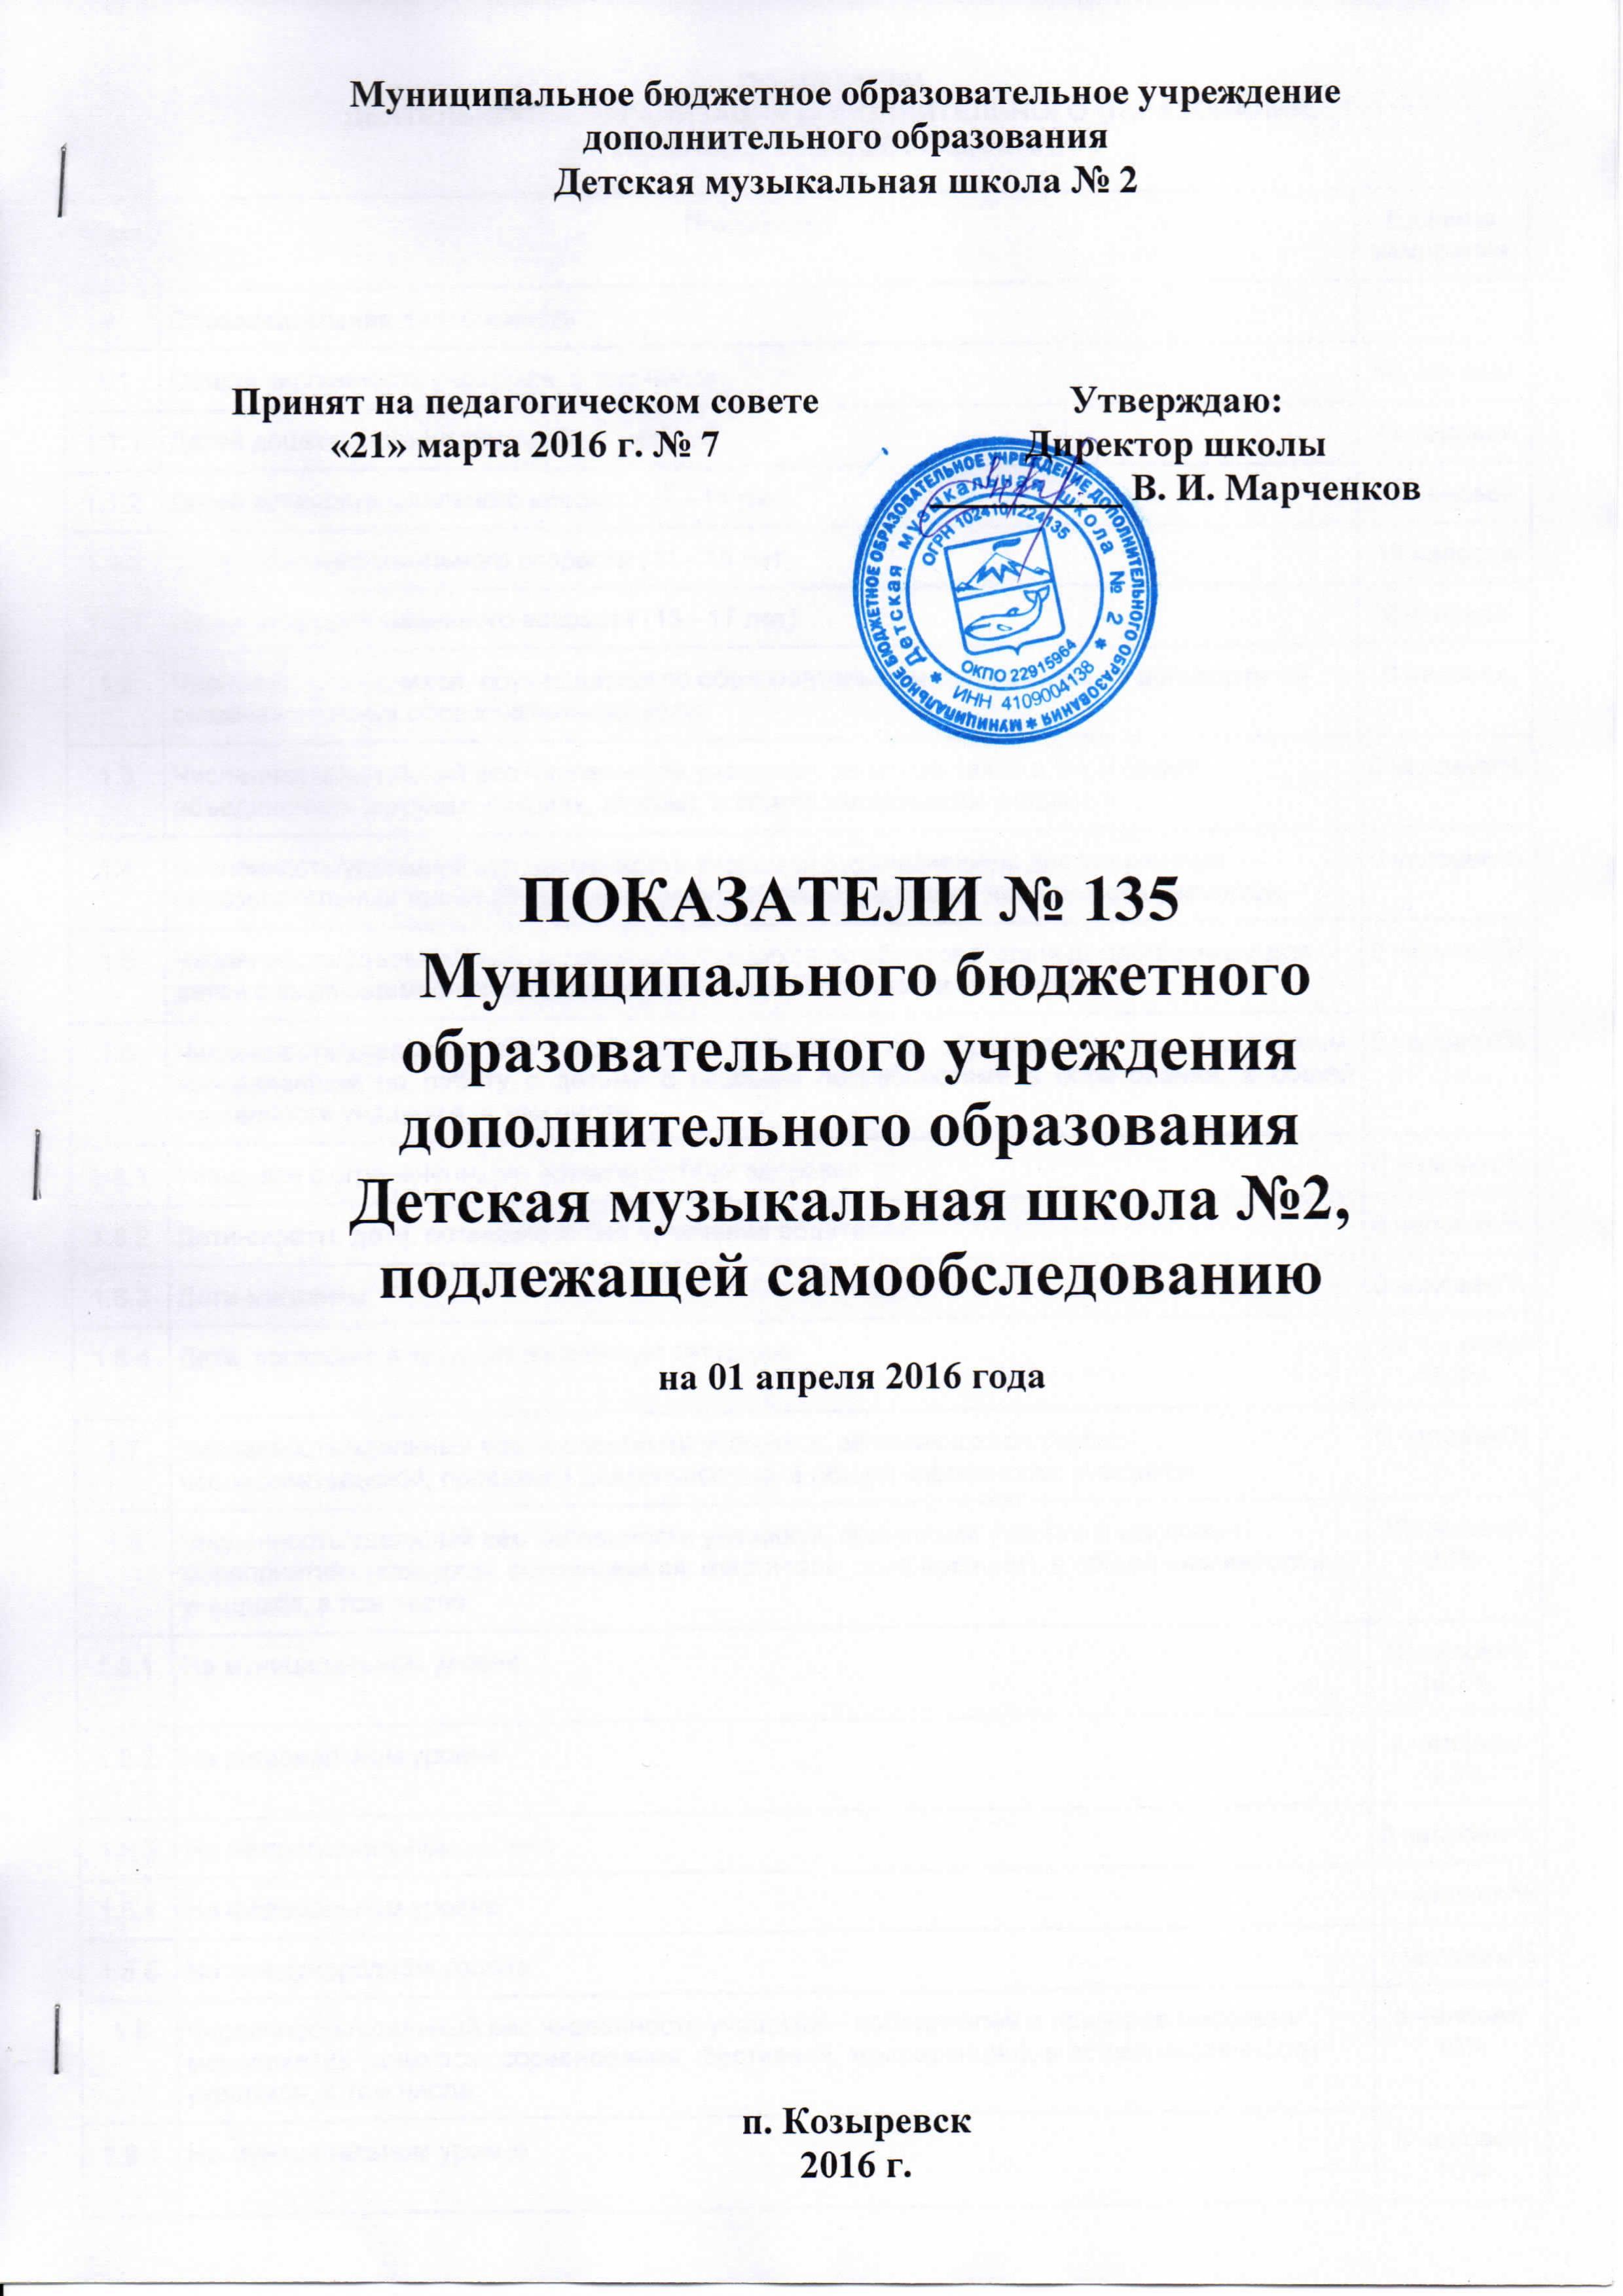 Показатели самообследования МБОУДО ДМШ №2 01.04.16_01